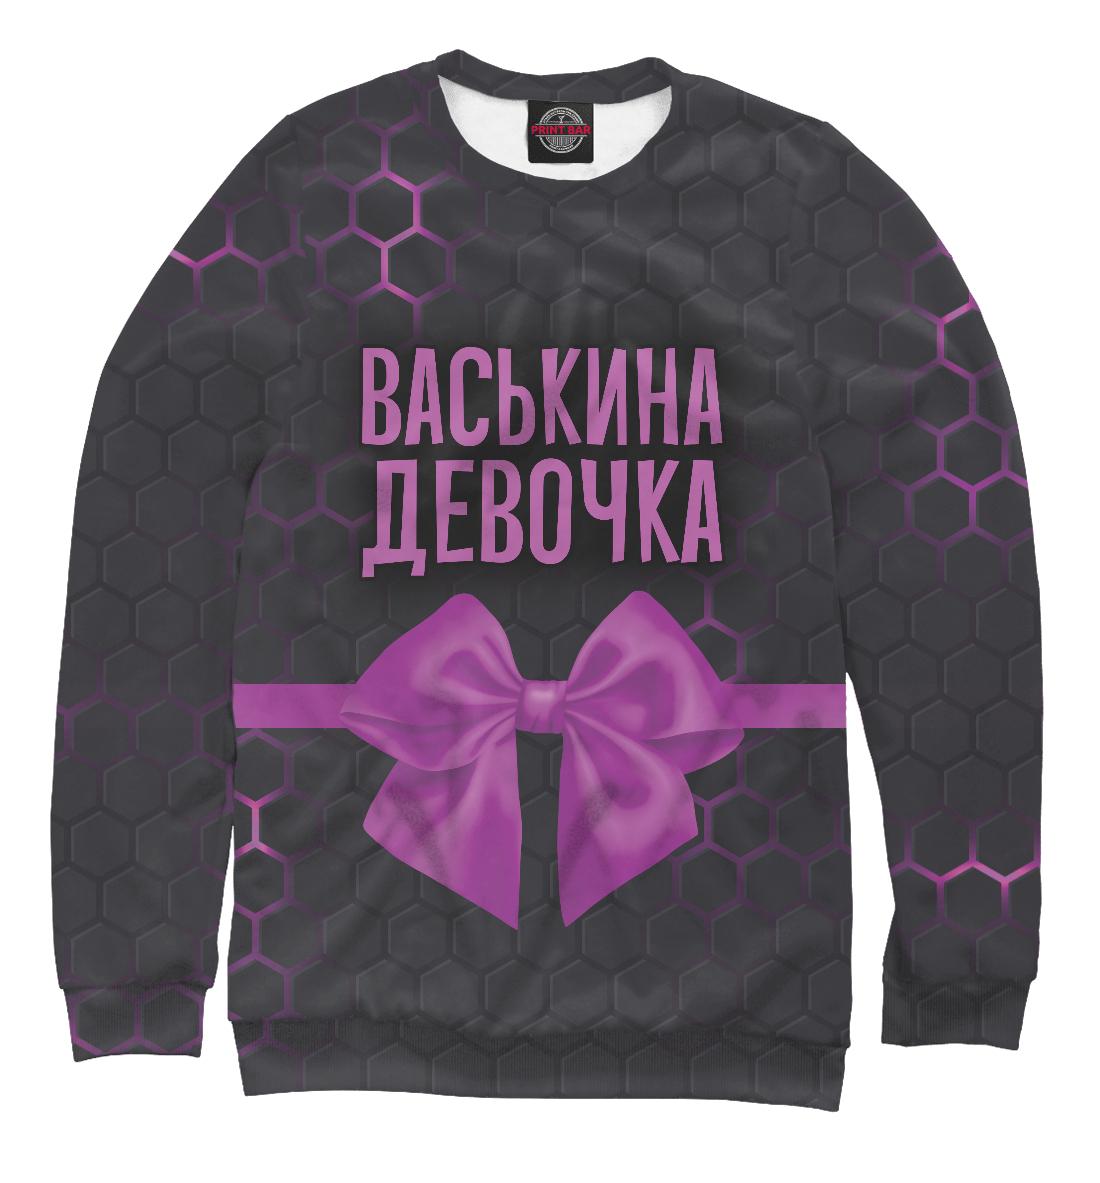 Свитшот Васькина девочка